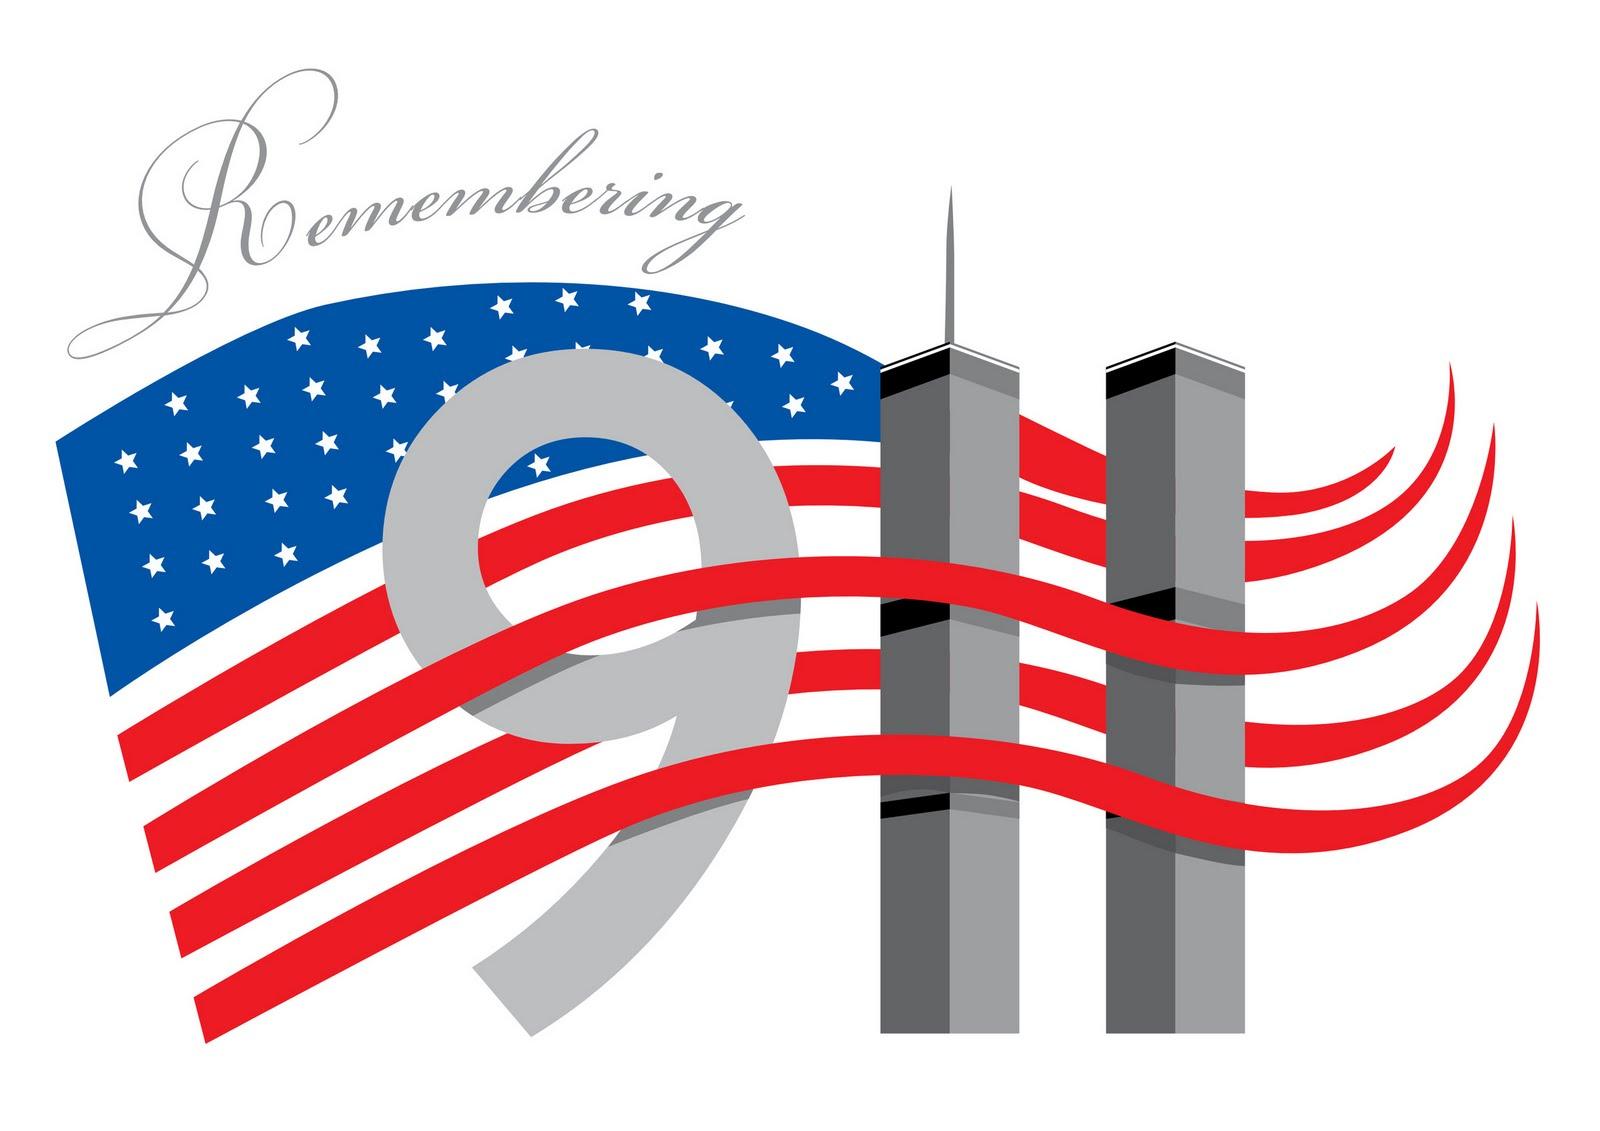 A 9-11